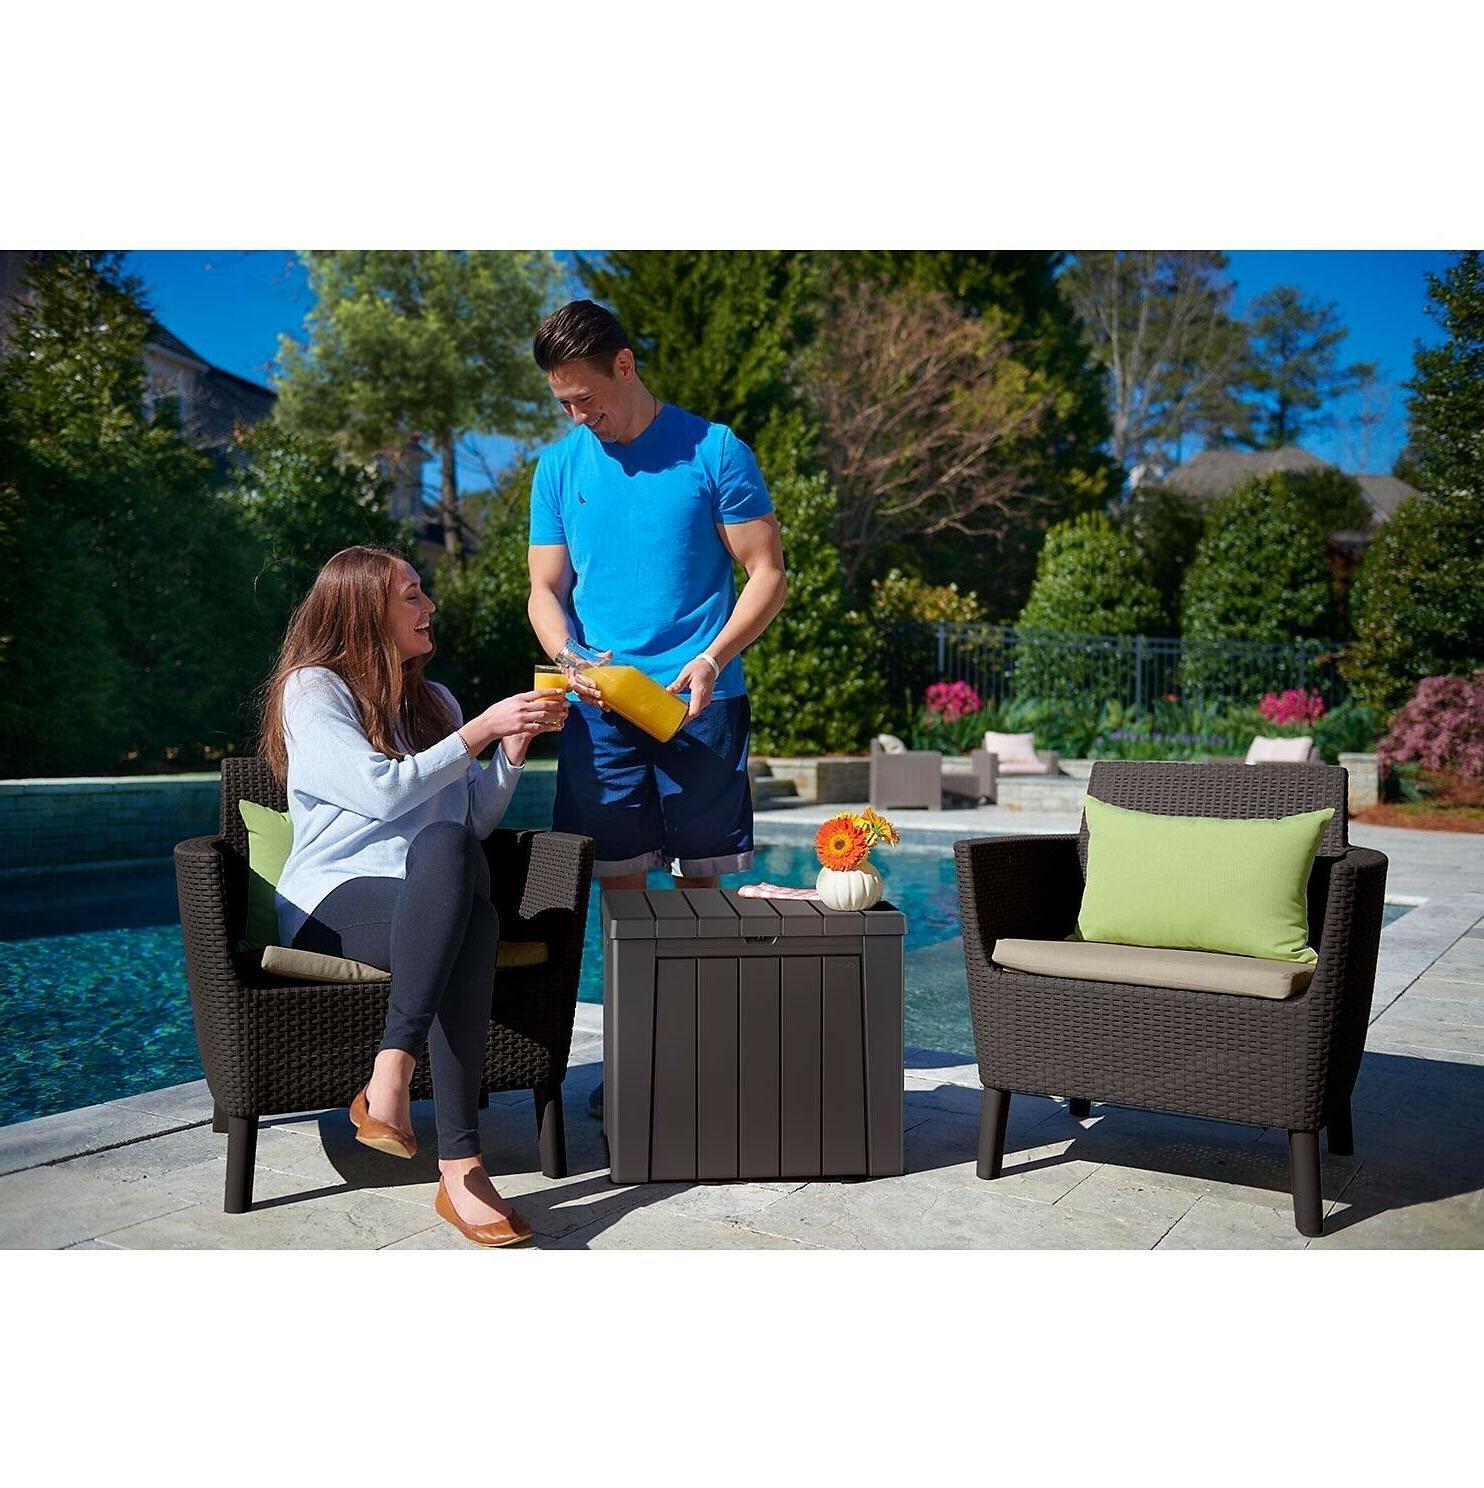 Keter Urban 30-Gallon Deck Box/Storage Table